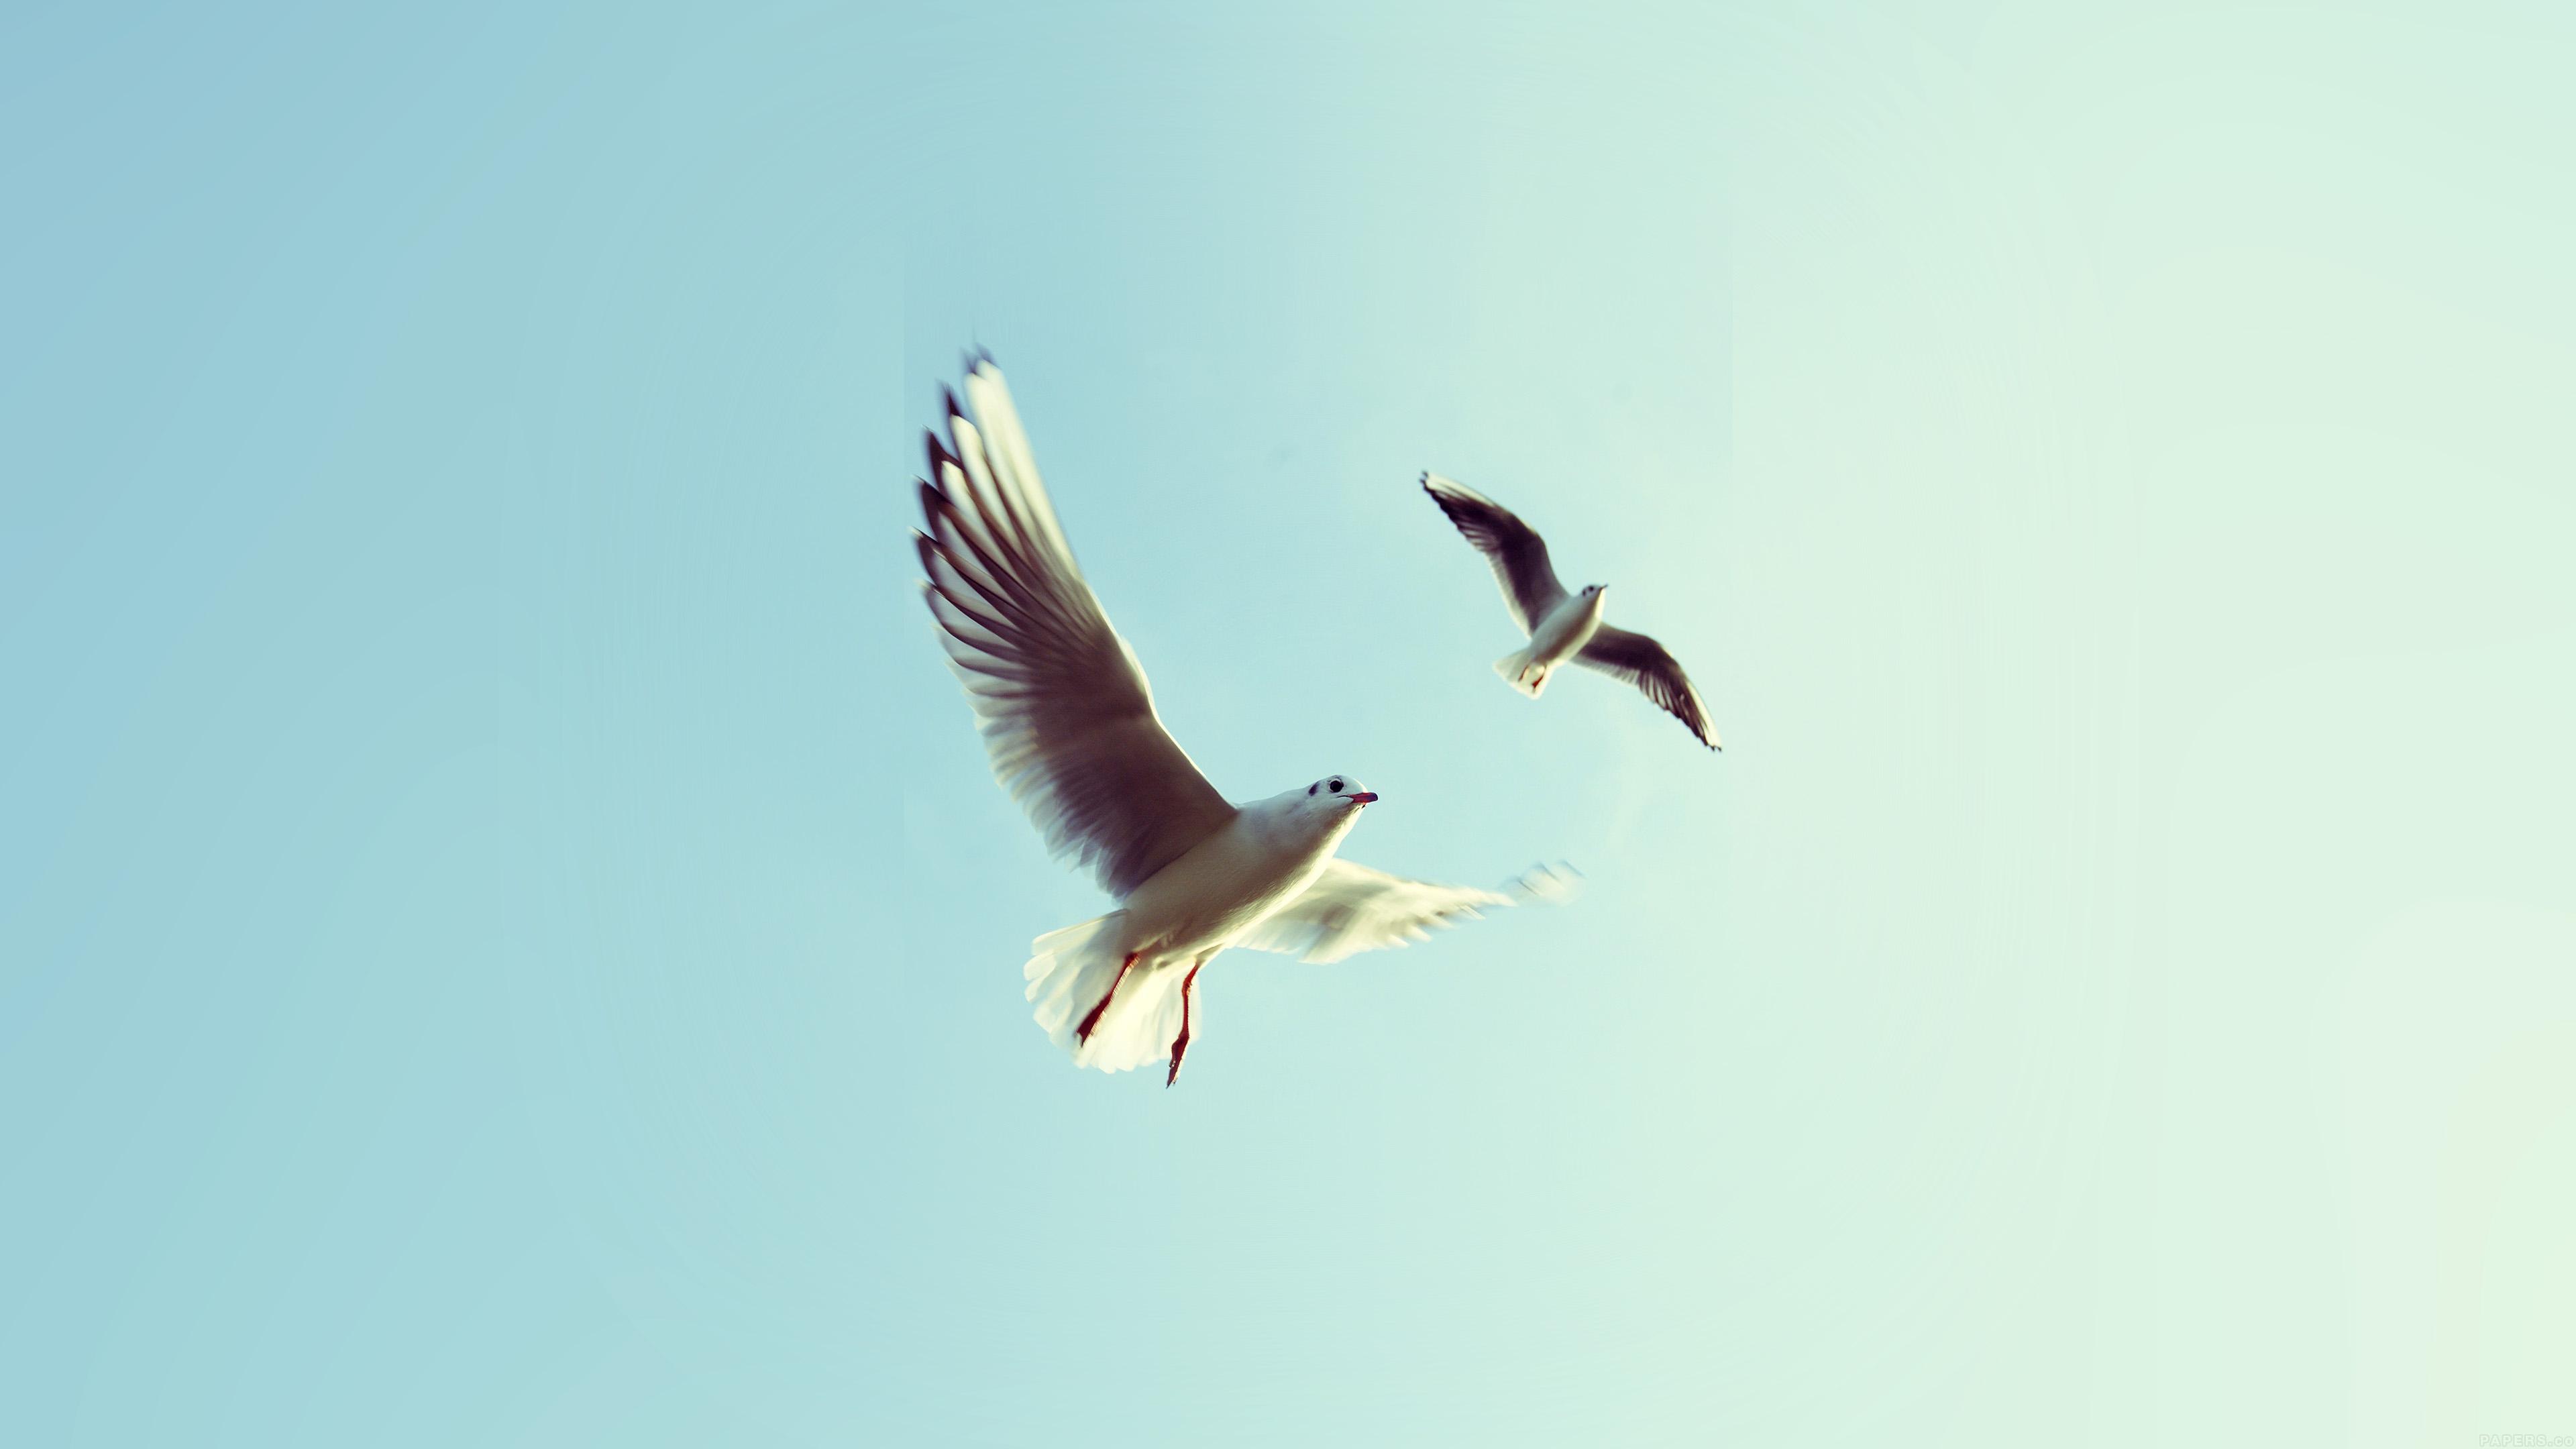 Wallpapers Hd Flying Birds Apple Animals Blue Sky Desktop: 3840 X 2400